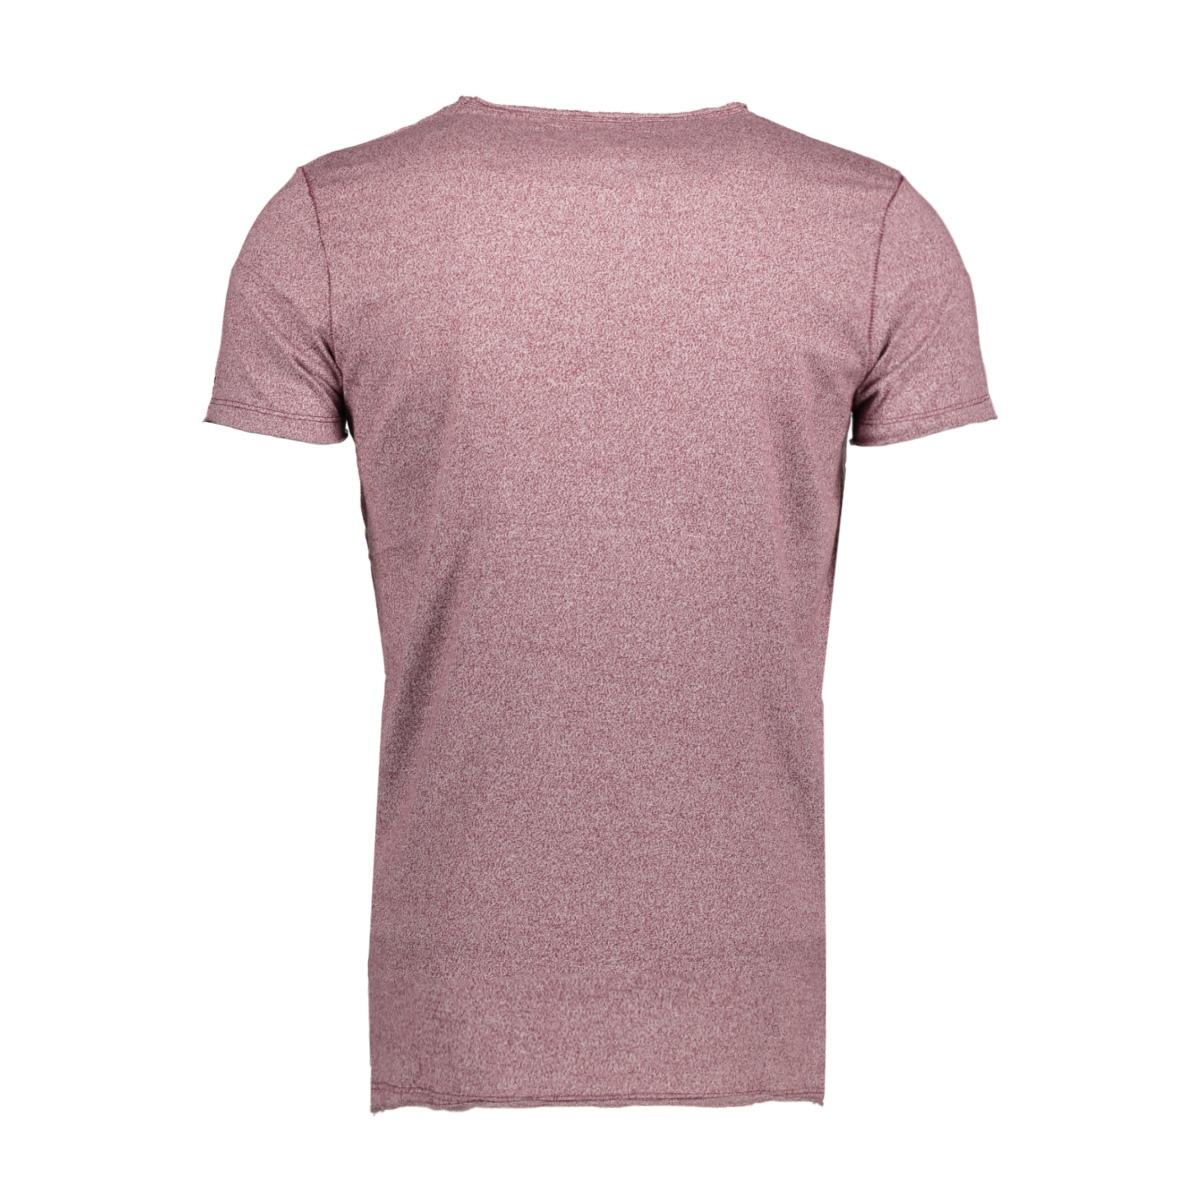 l71204 garcia t-shirt 825